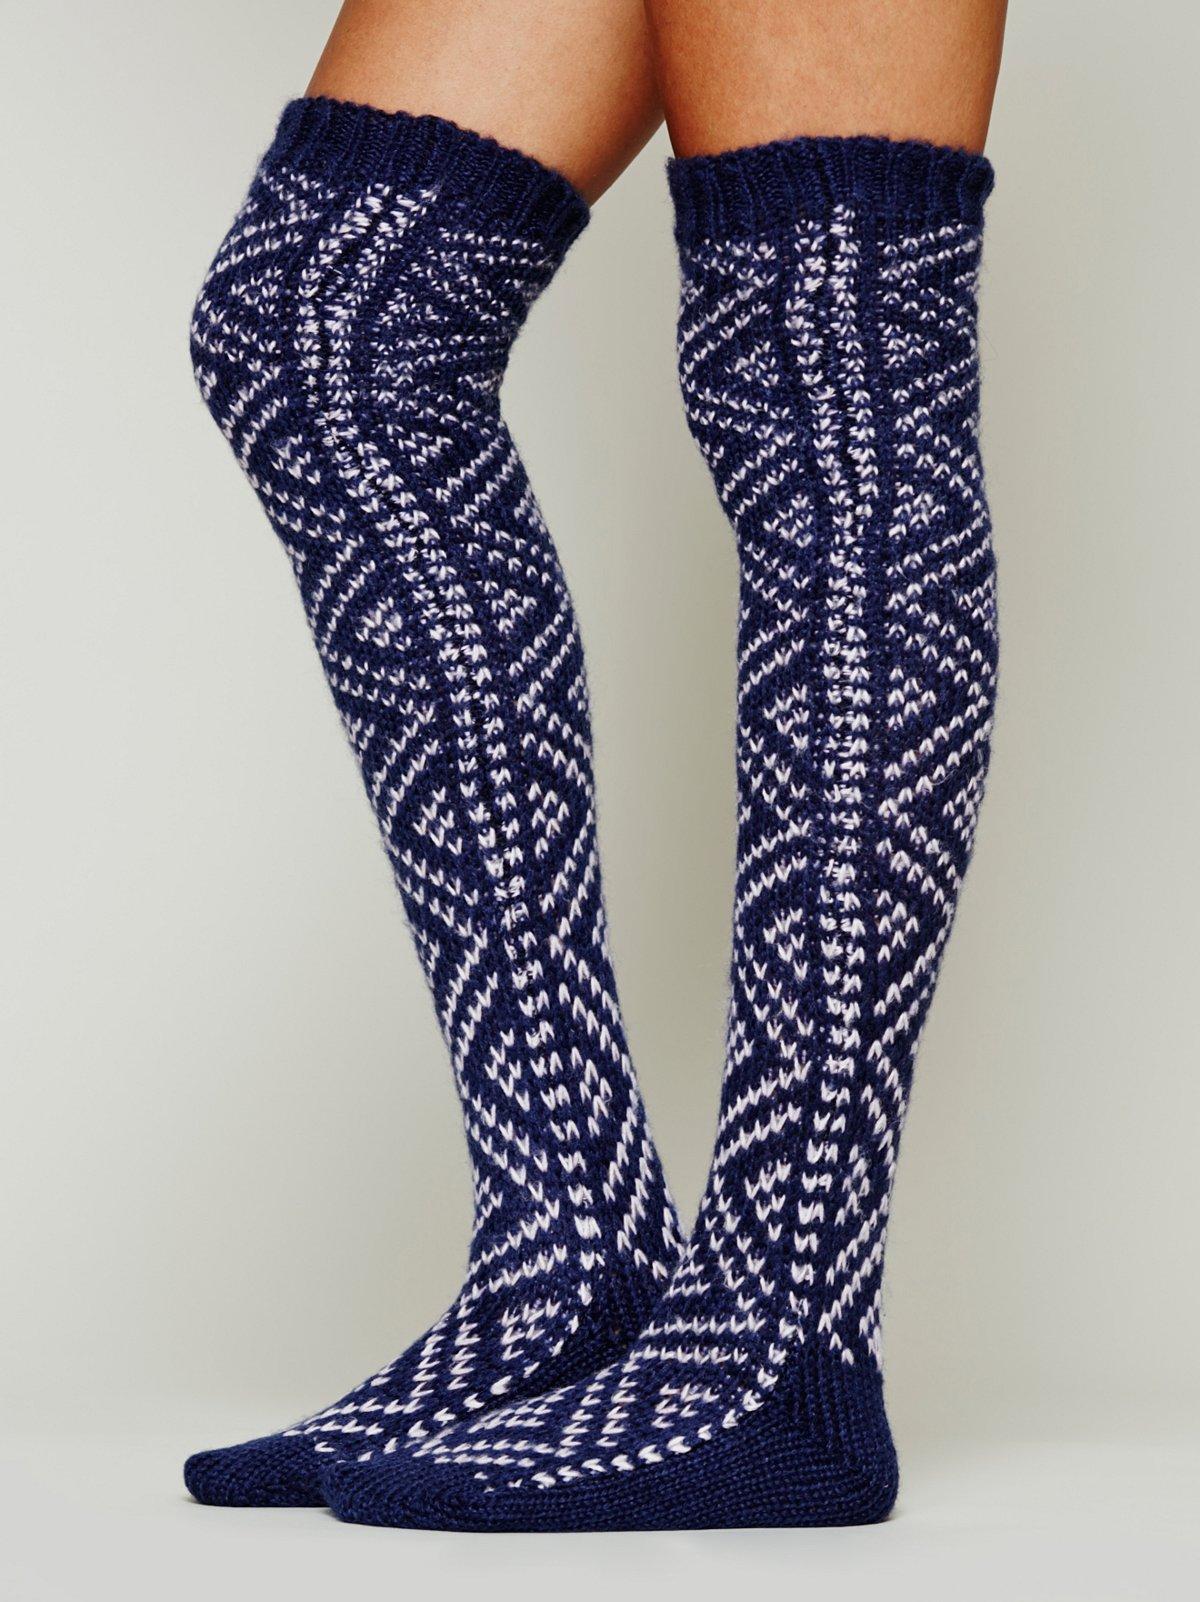 Peruvian Thigh High Sock